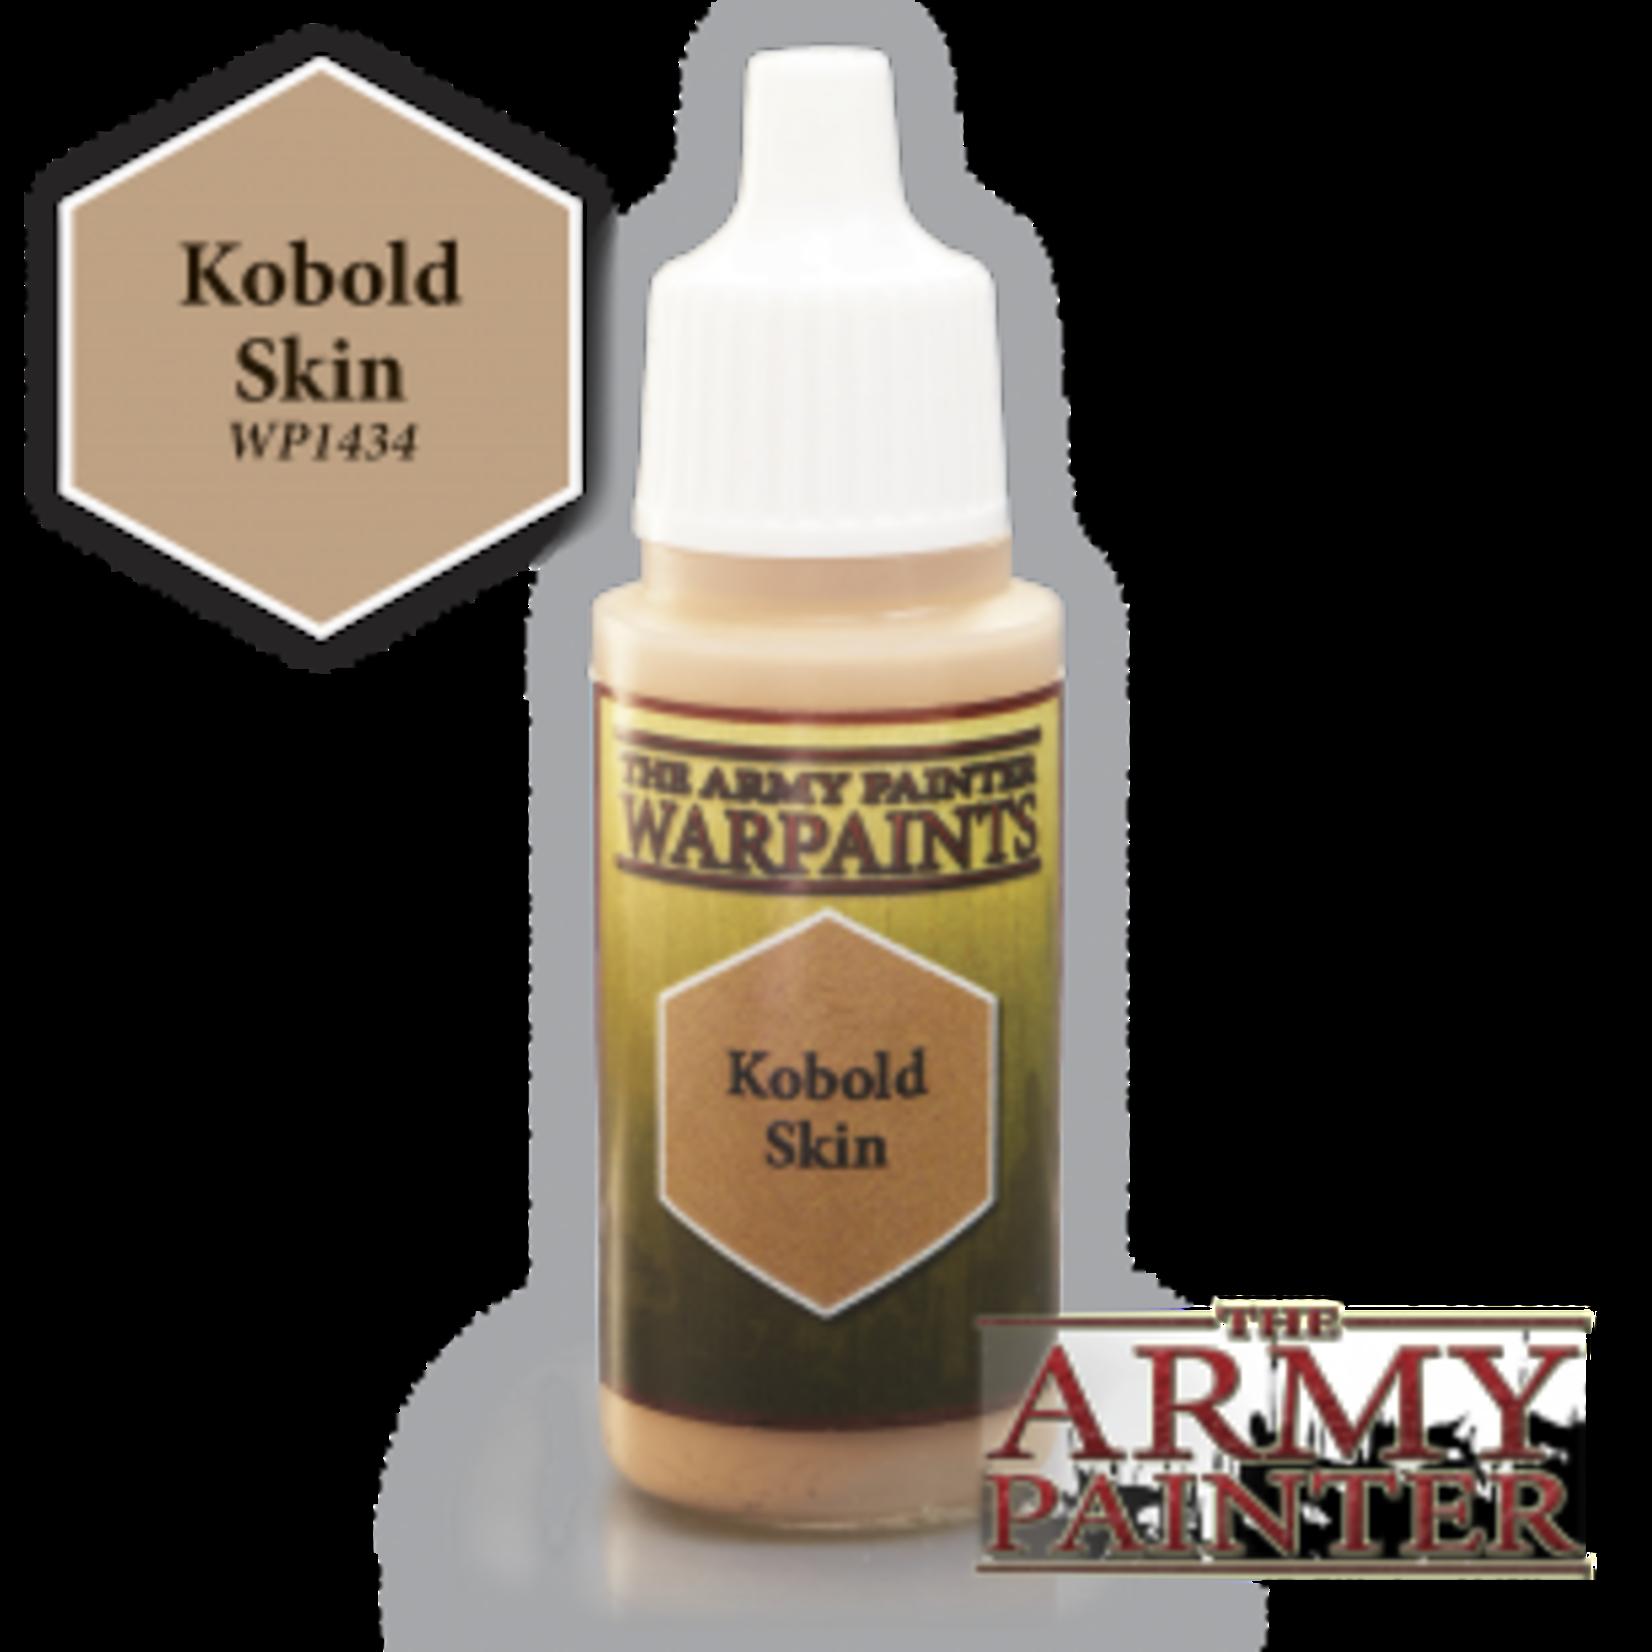 Army Painter Army Painter Warpaint Kobold Skin 18ml